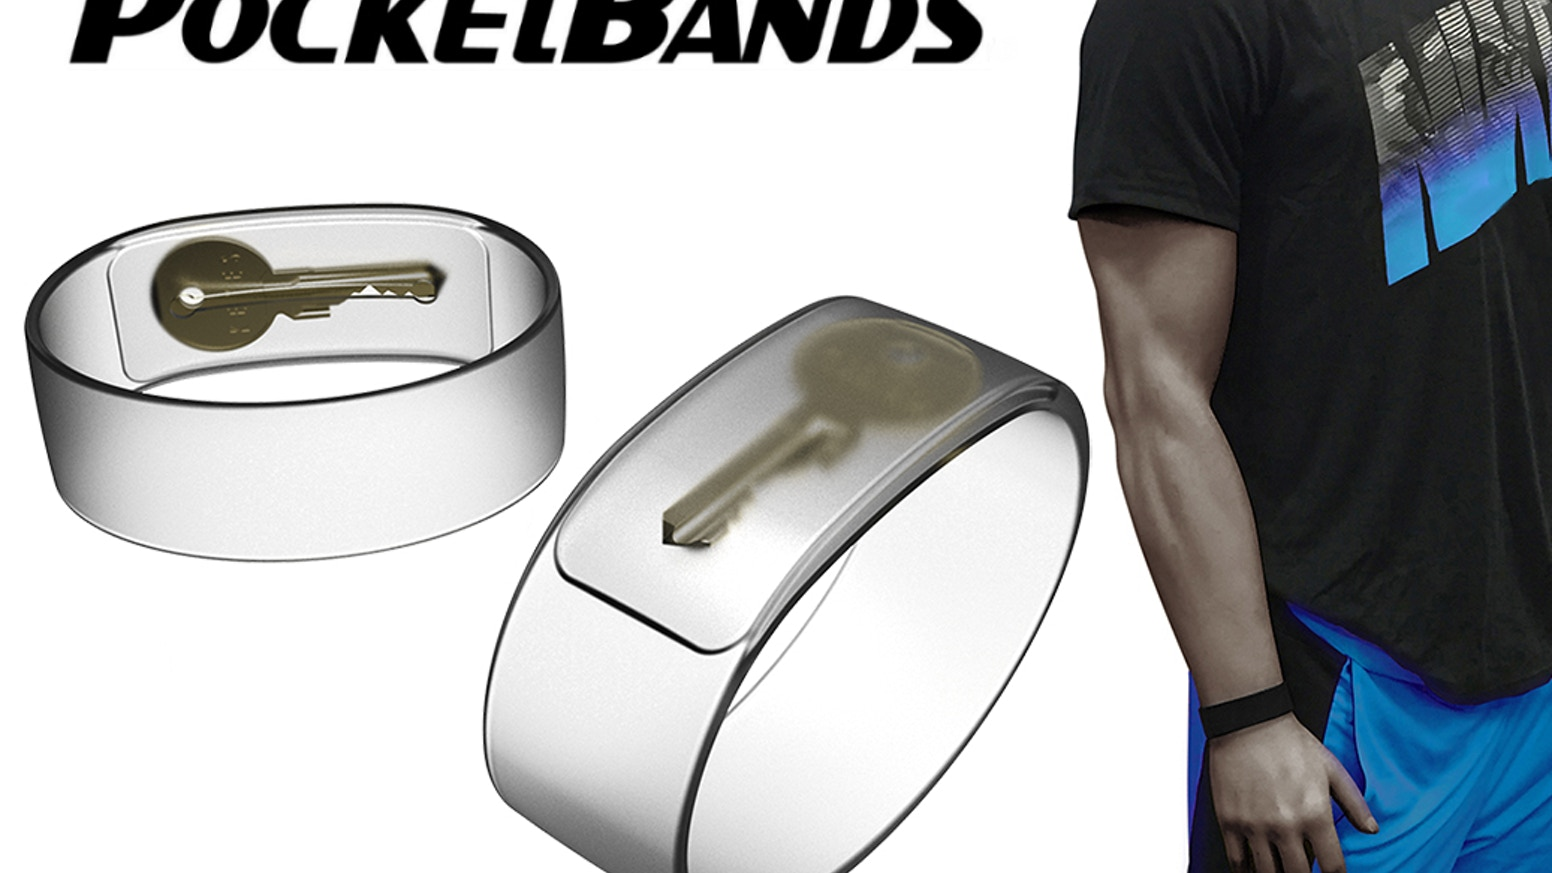 POCKETBANDS™ - Stash Keys, Money and More! New Slim Design Wristband with a Hidden Pocket.